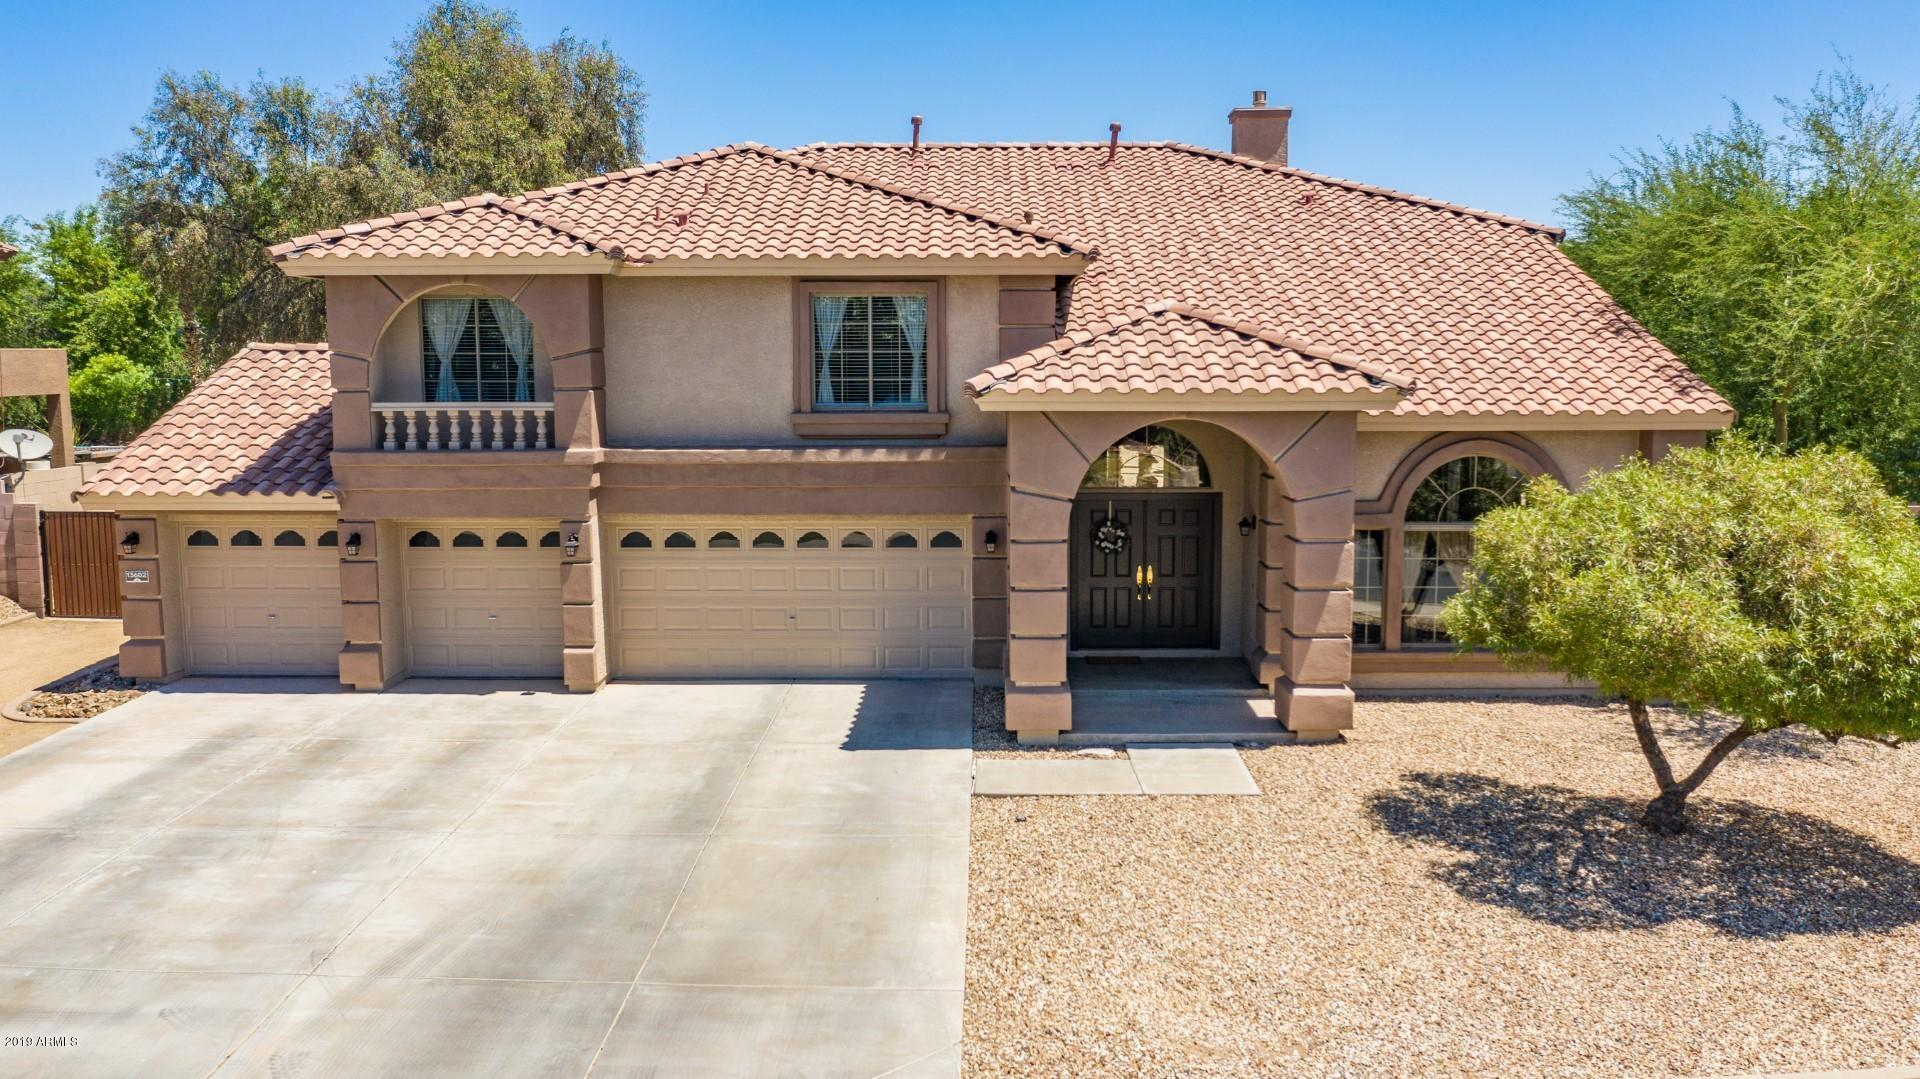 Photo of 13602 W DENTON Street, Litchfield Park, AZ 85340